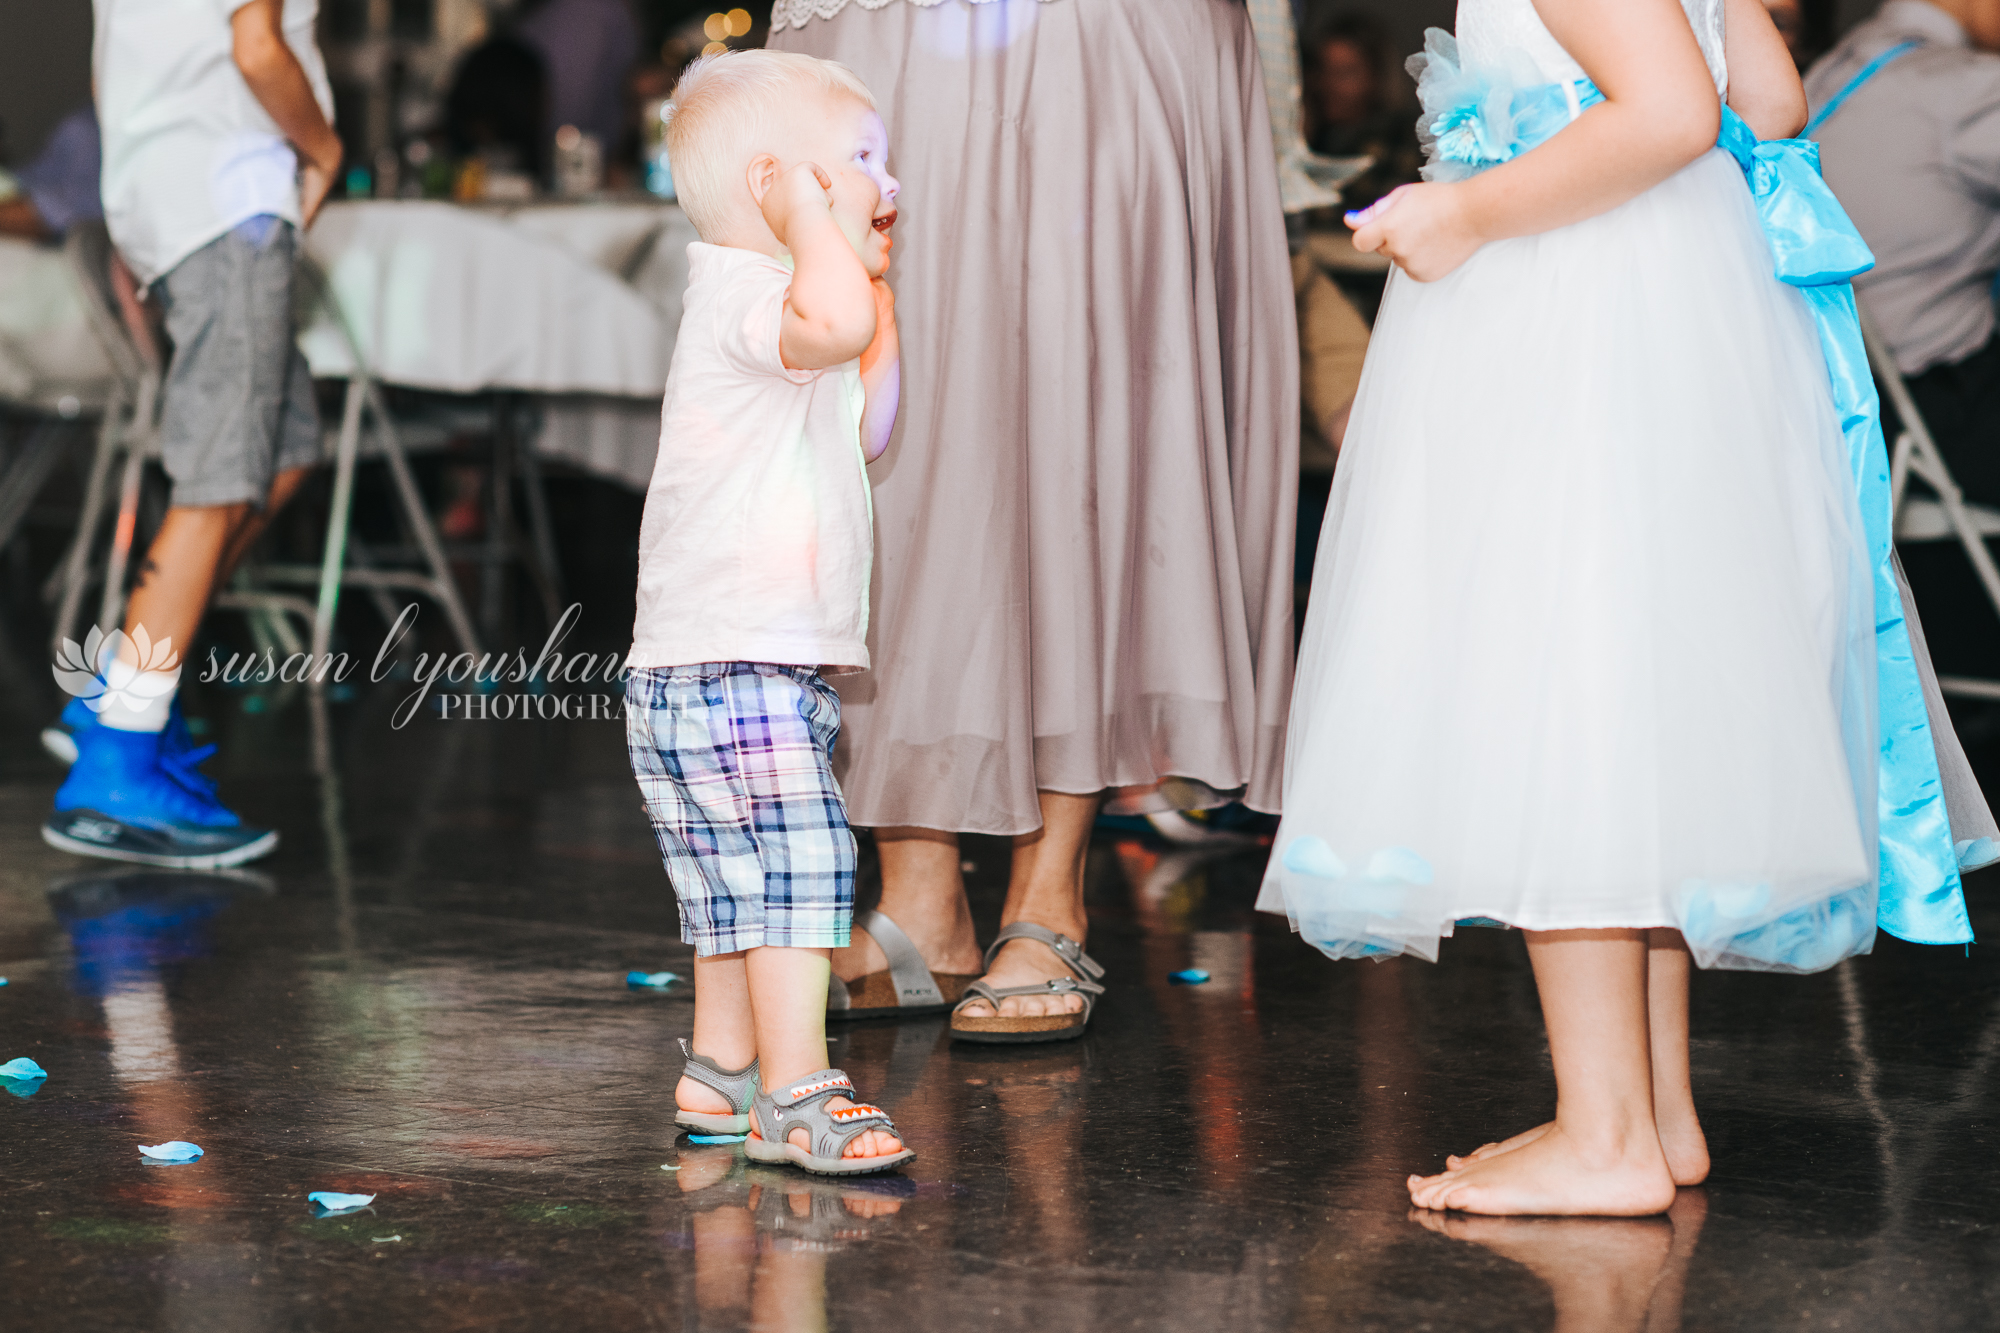 Katelyn and Wes Wedding Photos 07-13-2019 SLY Photography-125.jpg